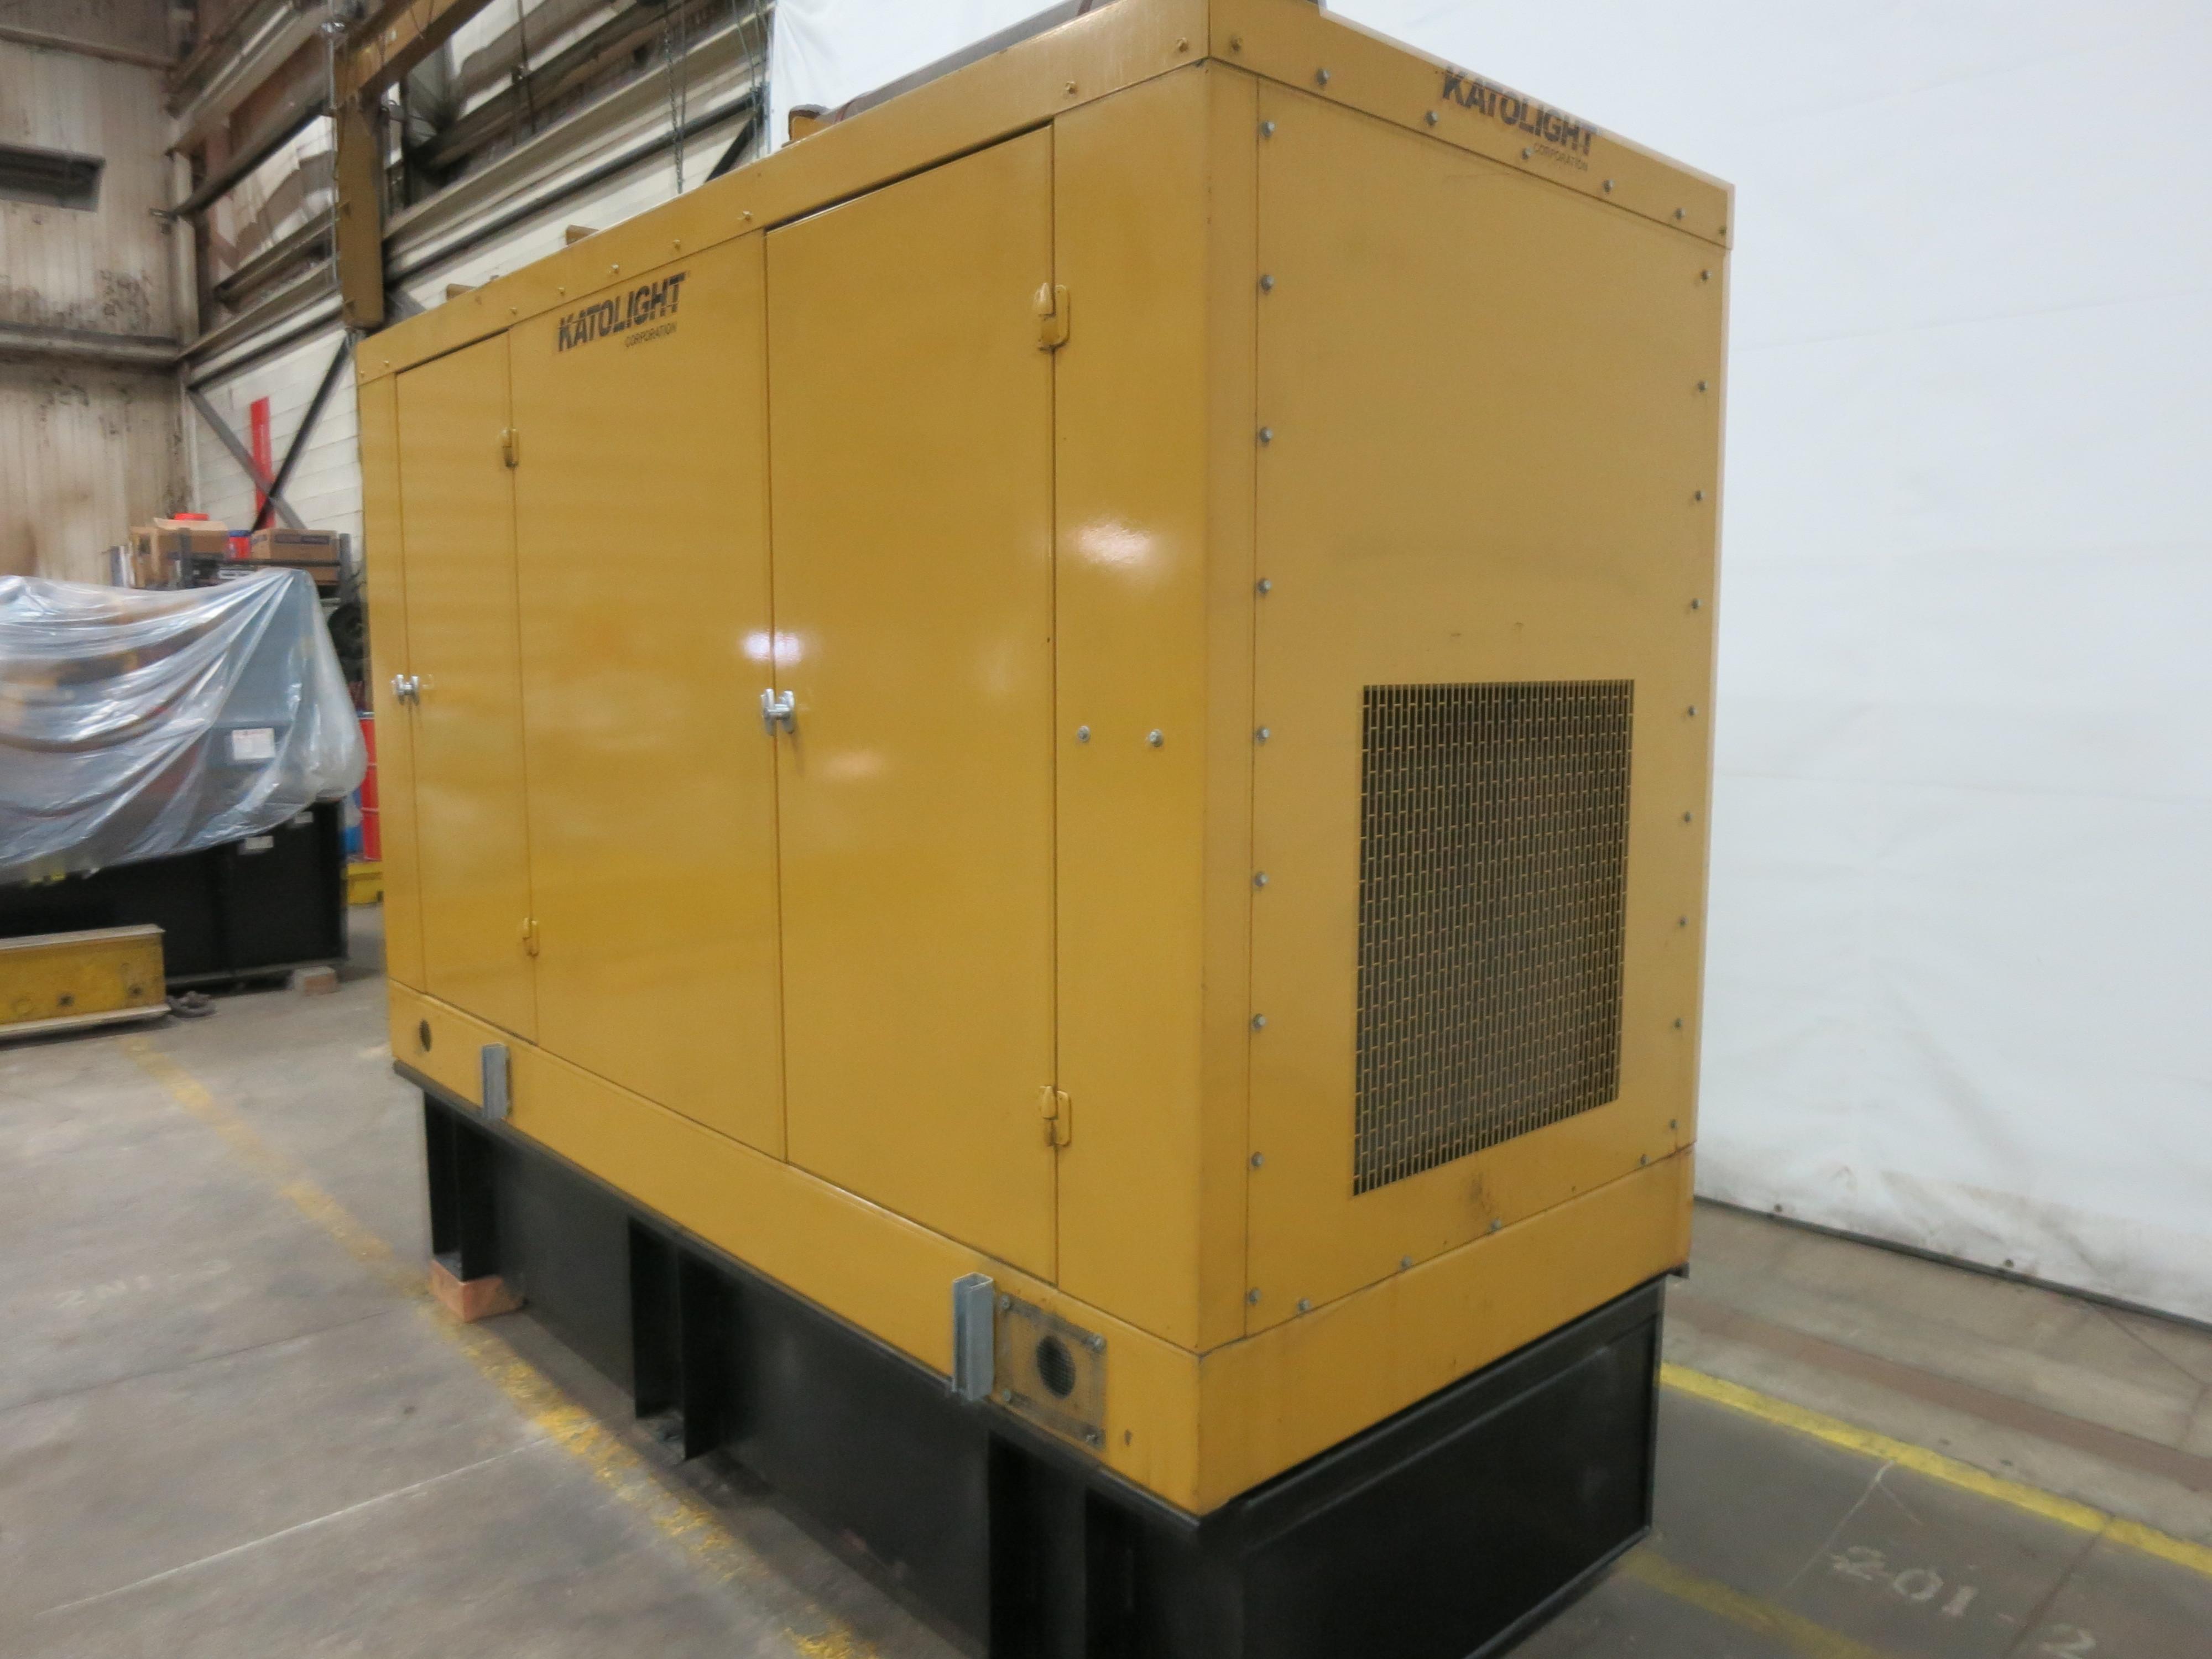 used katolight d125fjj4 diesel generator | 313 hrs | 125 kw | 0 price | csdg